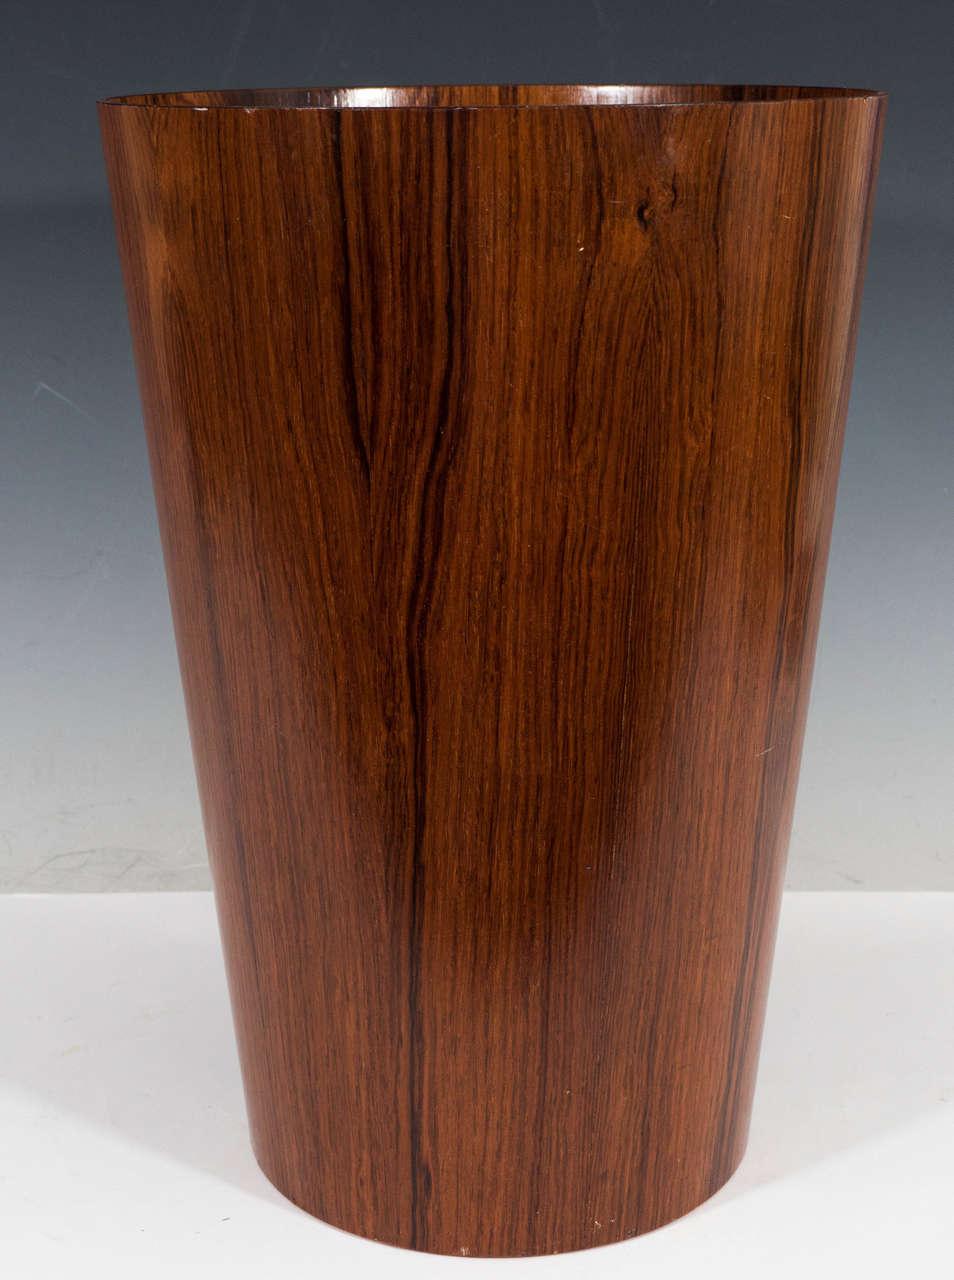 A Vintage Scandinavian Cylindrical Waste Basket Veneered In Exotic Wood Marked On Underside With